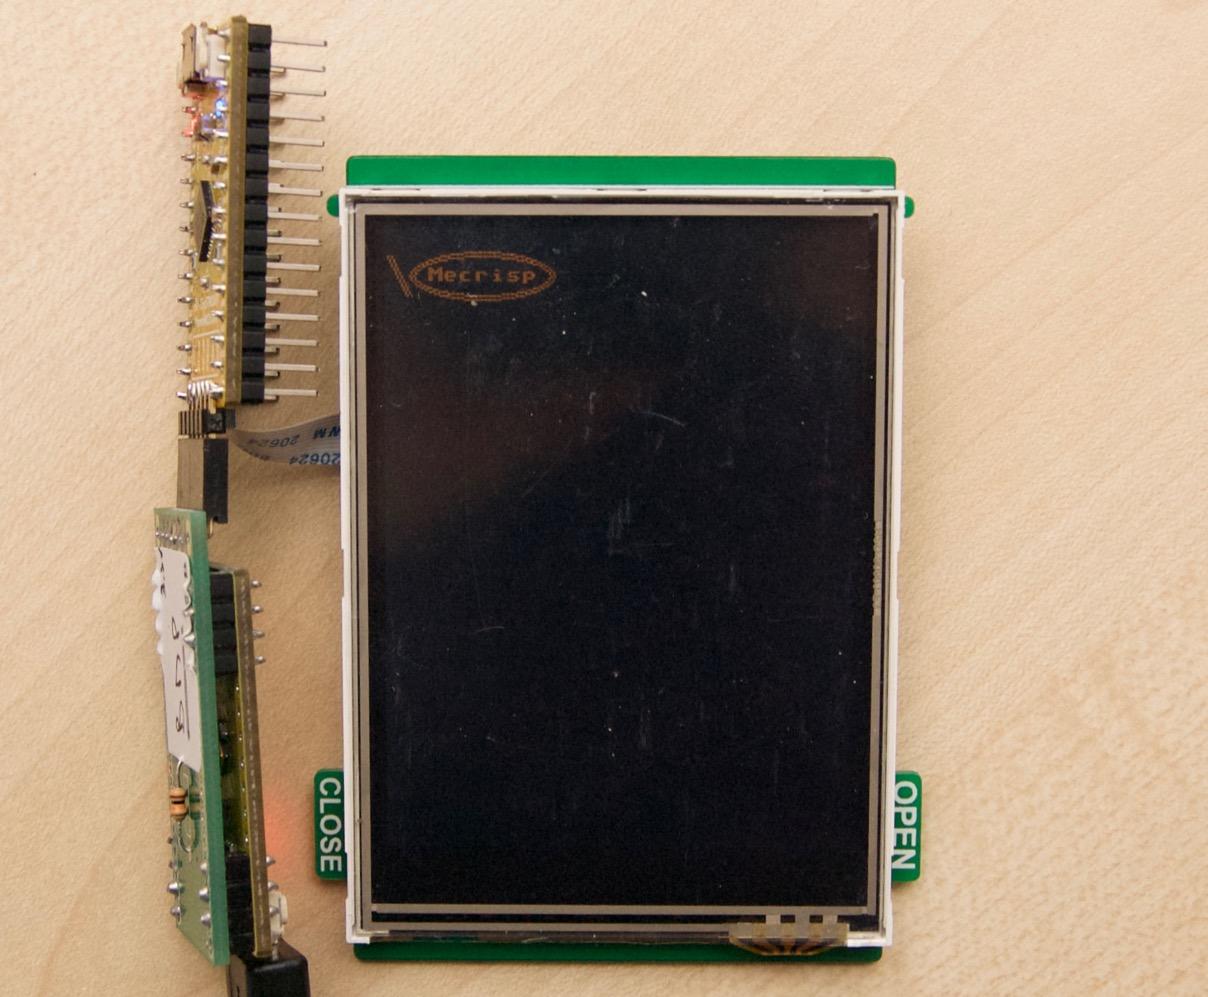 OpenEnergyMonitor aggregator